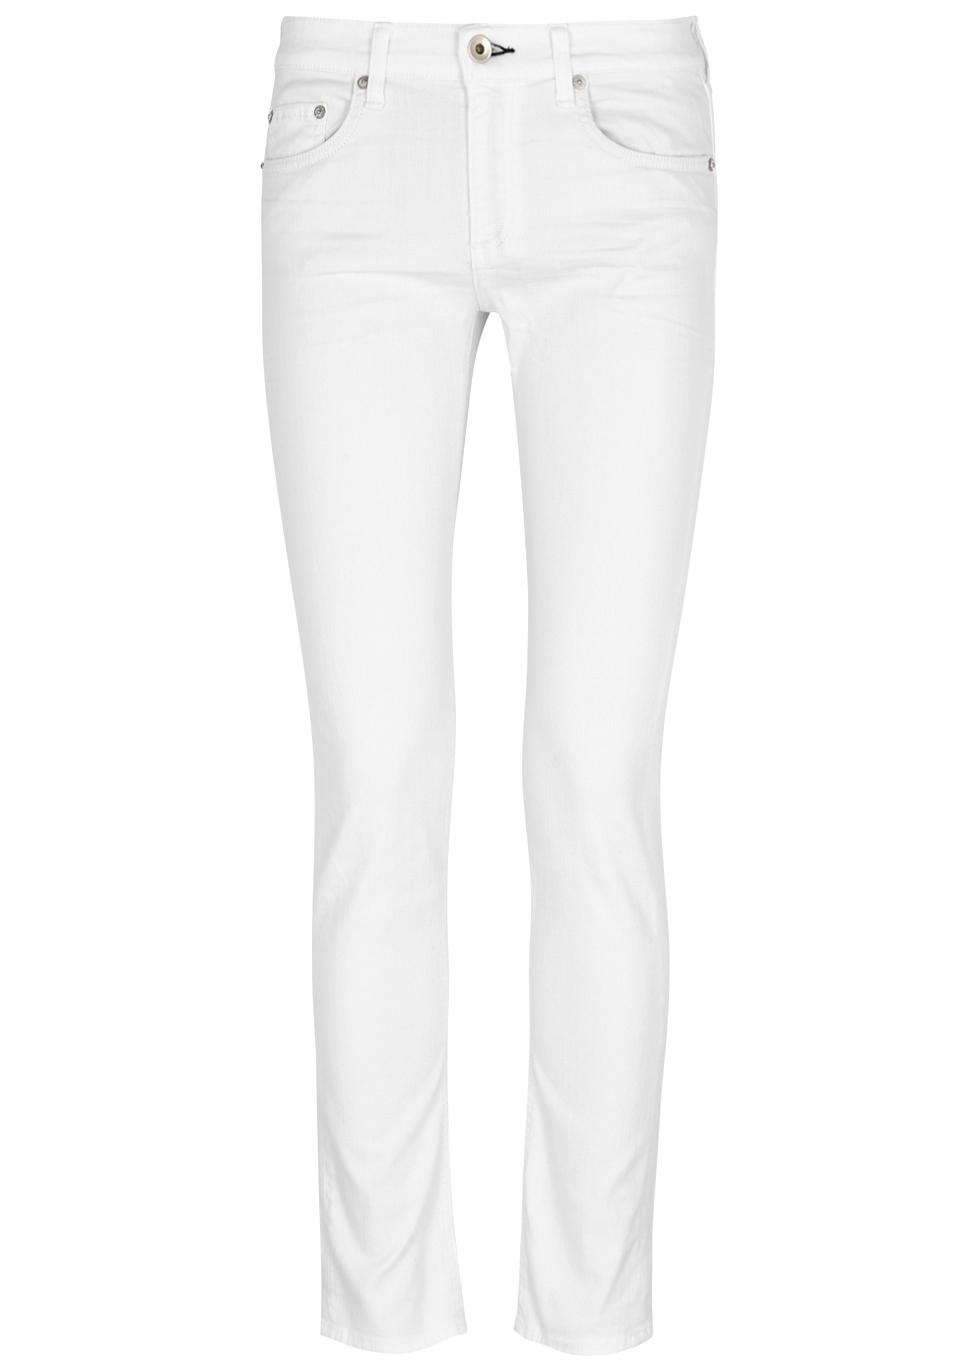 Dre white slim-boyfriend jeans